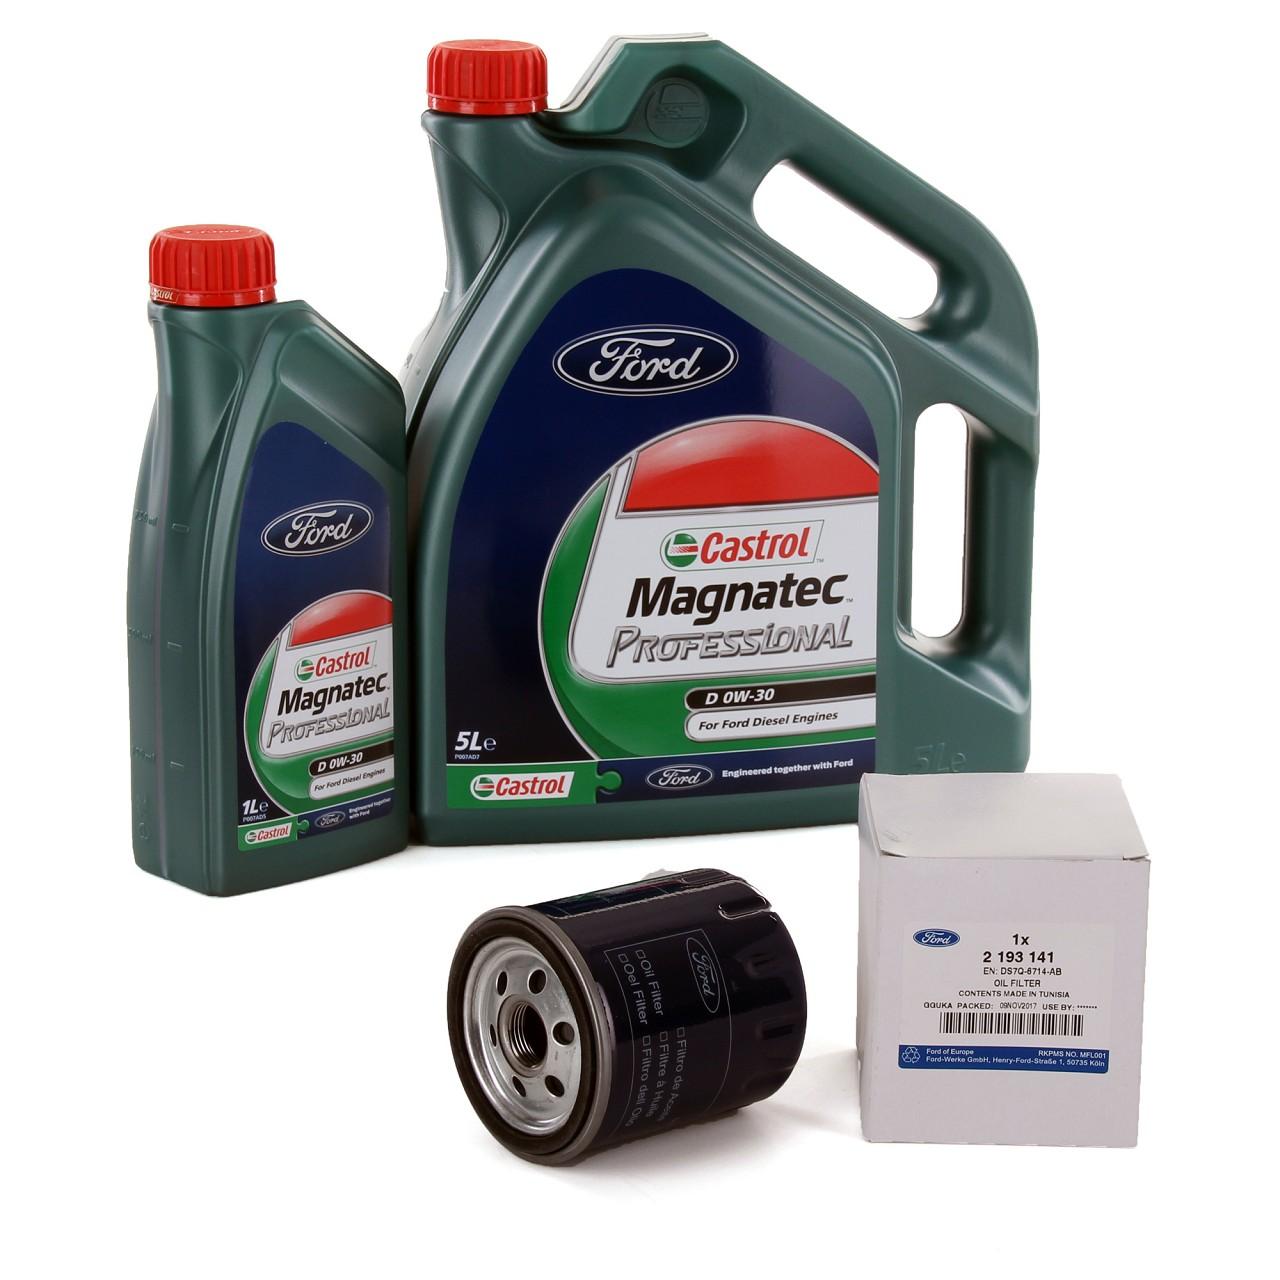 ORIGINAL Ford CASTROL 0W30 6 L + Filter 2193141 FOCUS GALAXY MONDEO V 2.0 TDCi